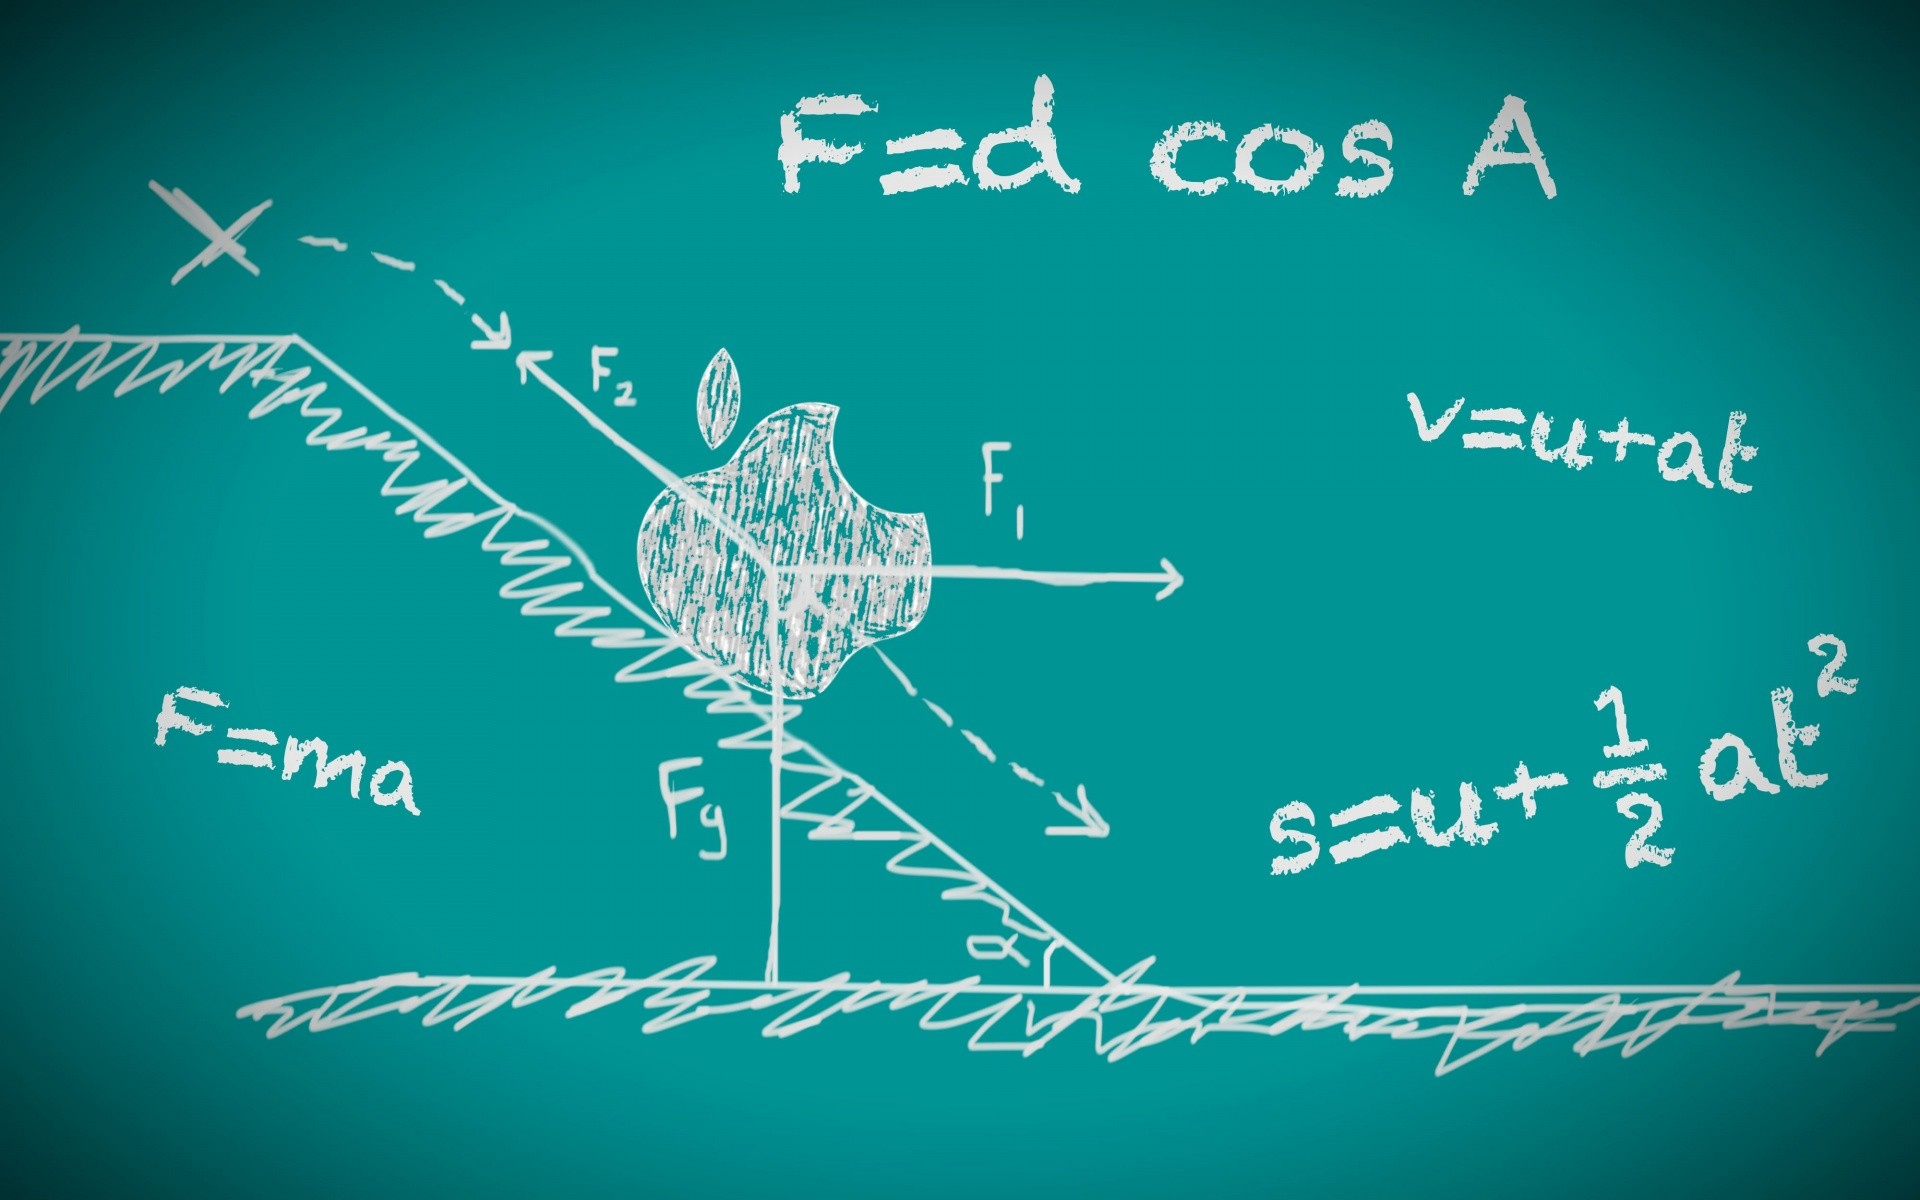 Physics Formulas Wallpaper Physics, wallpapers